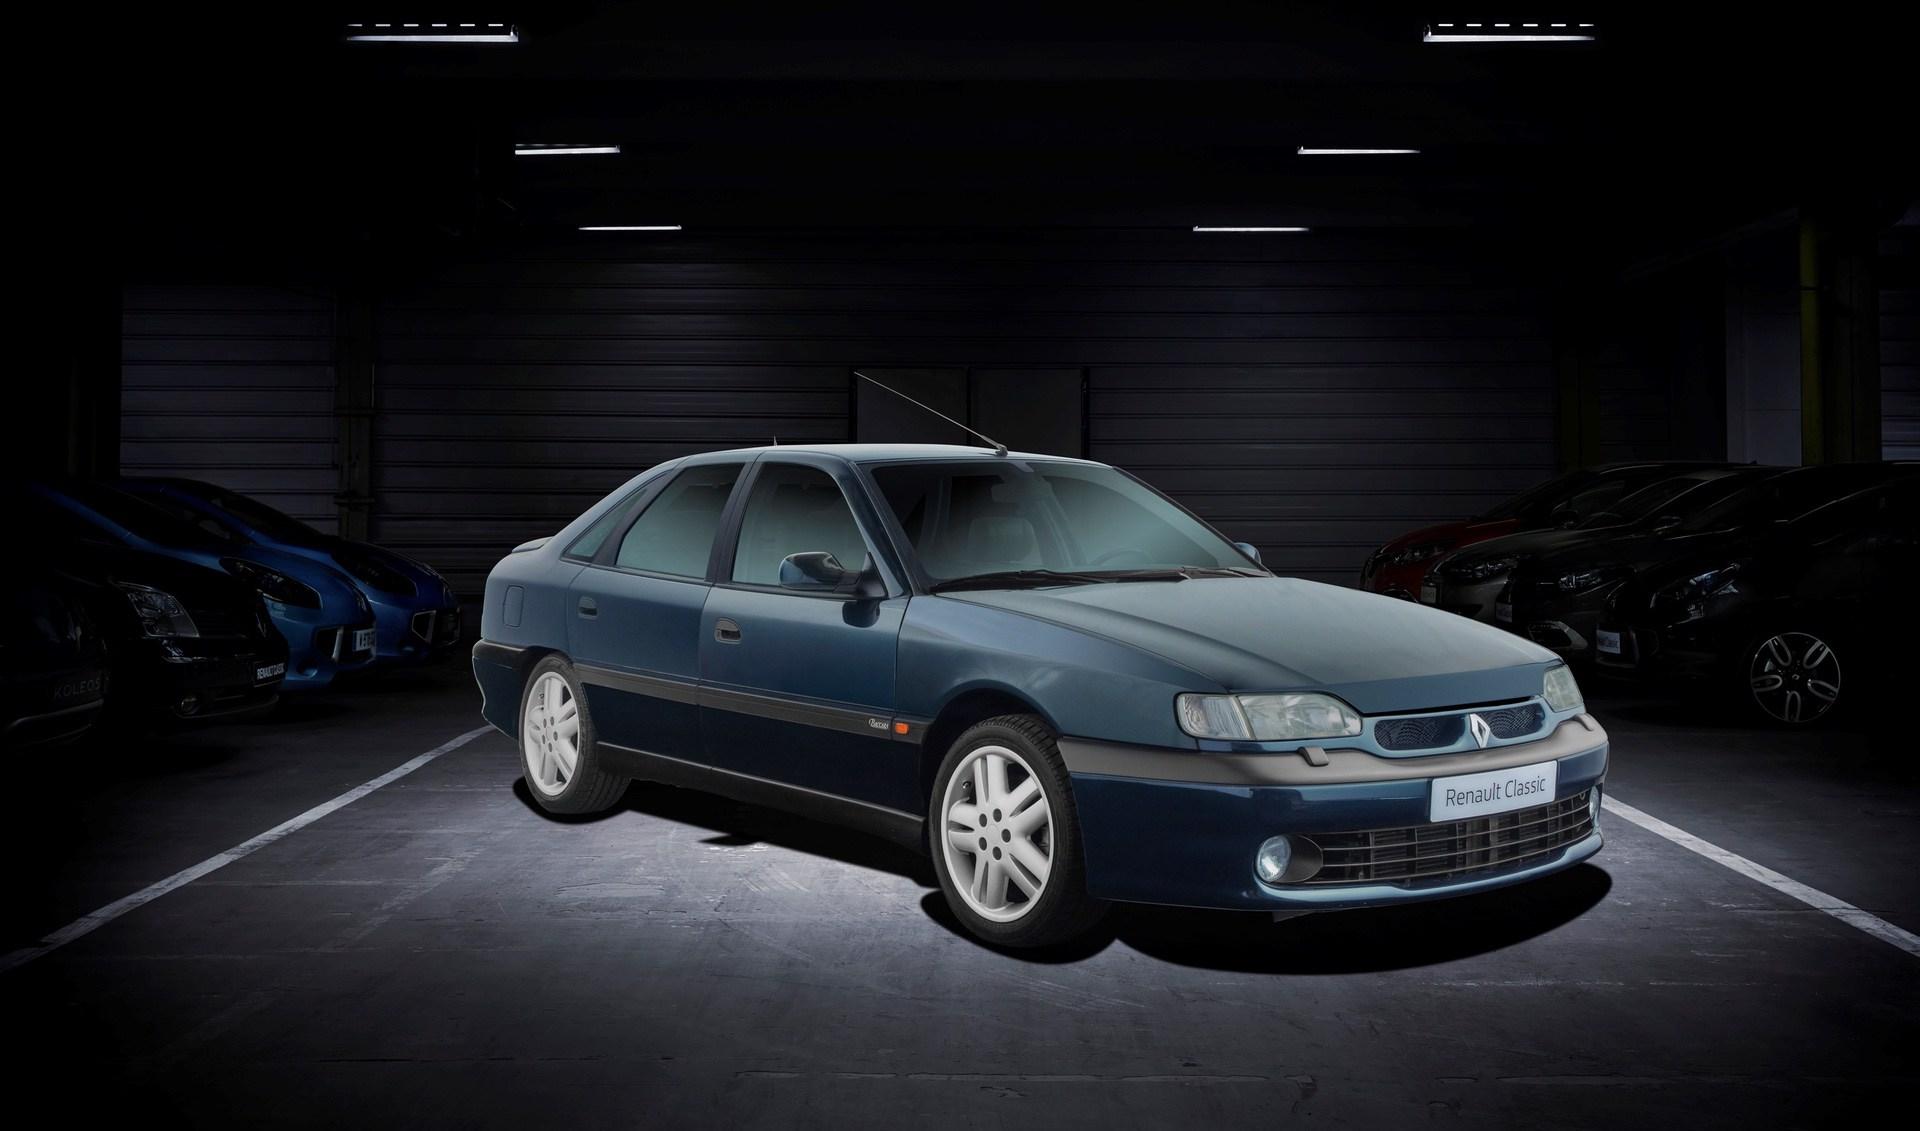 1993 - Renault Safrane Biturbo